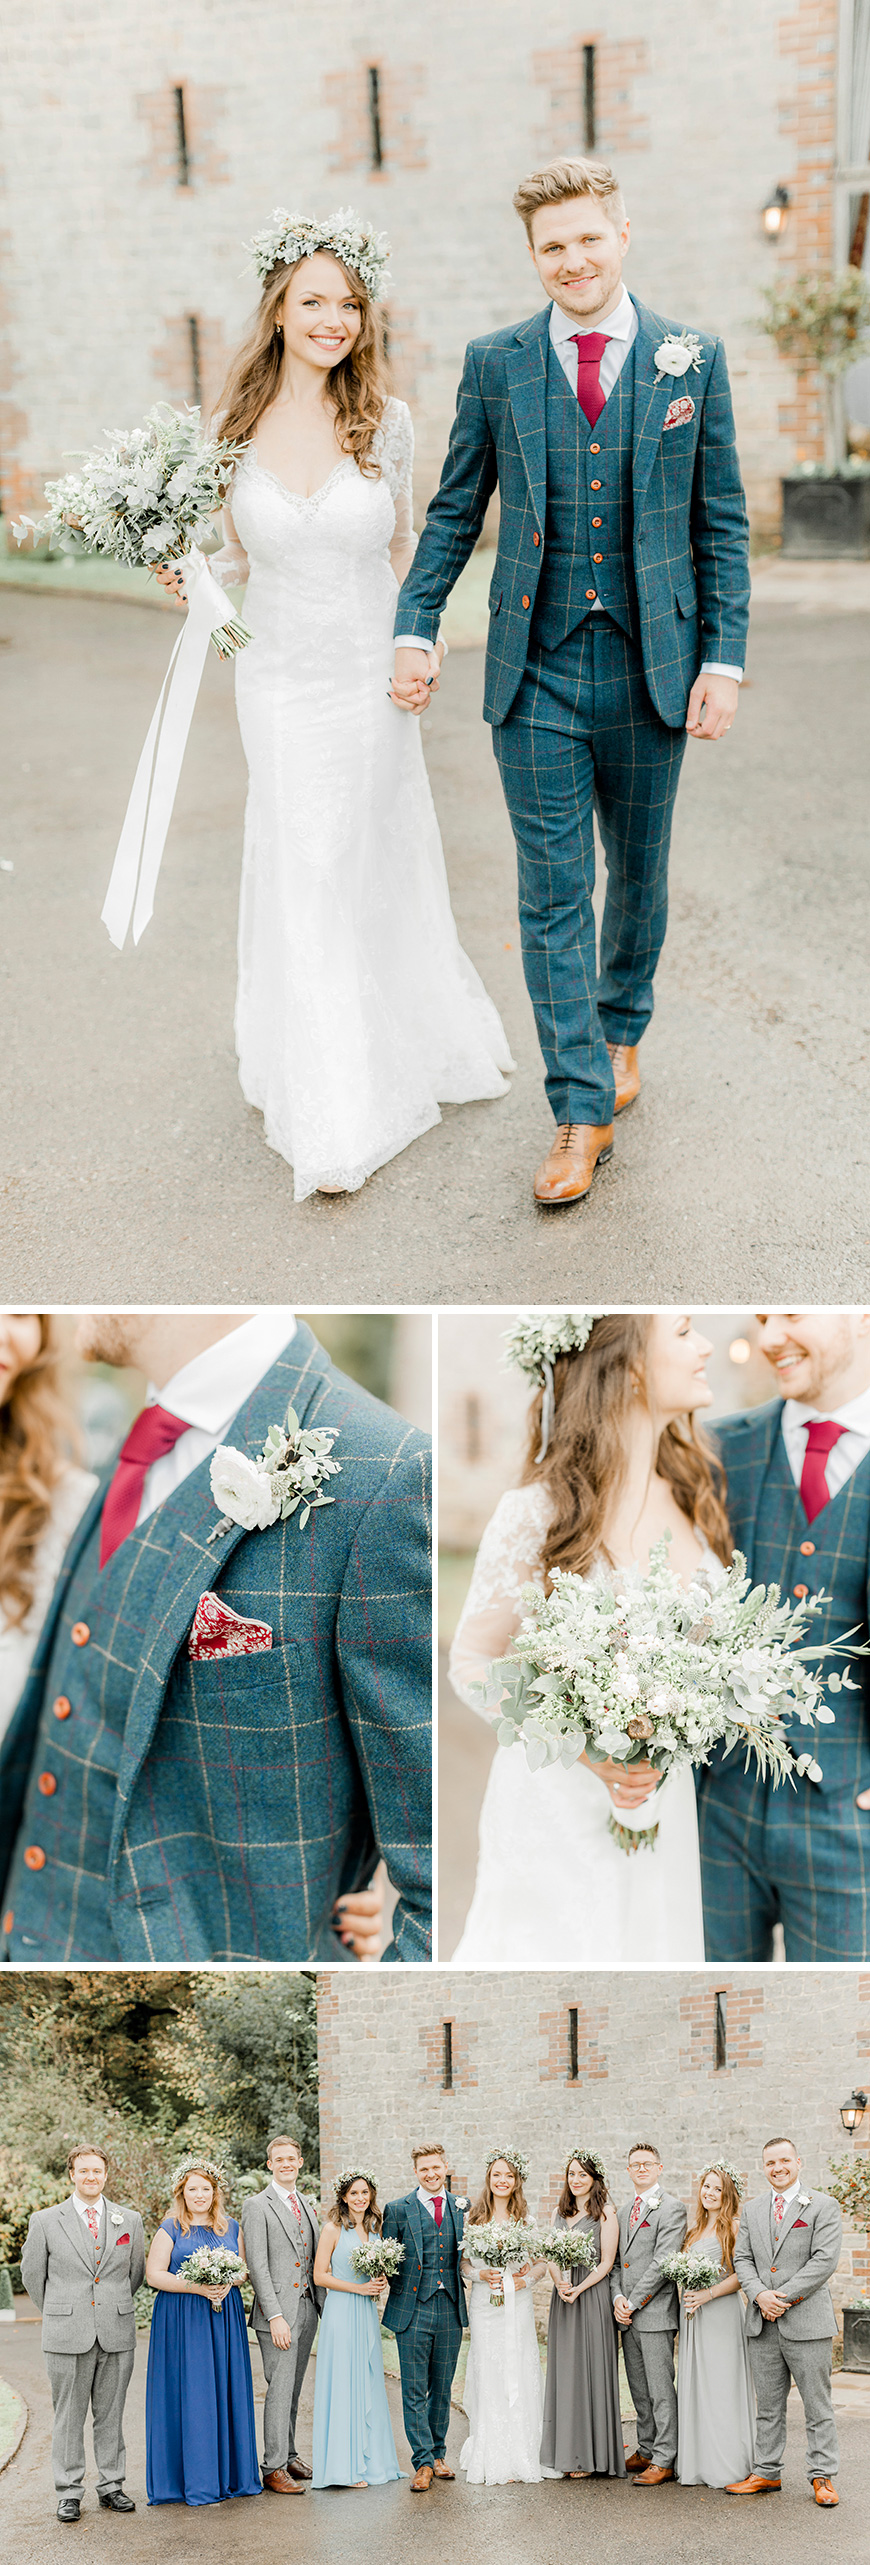 Real Wedding - Keziah and Sam's Romantic Woodland Wedding at Bartholomew Barn | CHWV